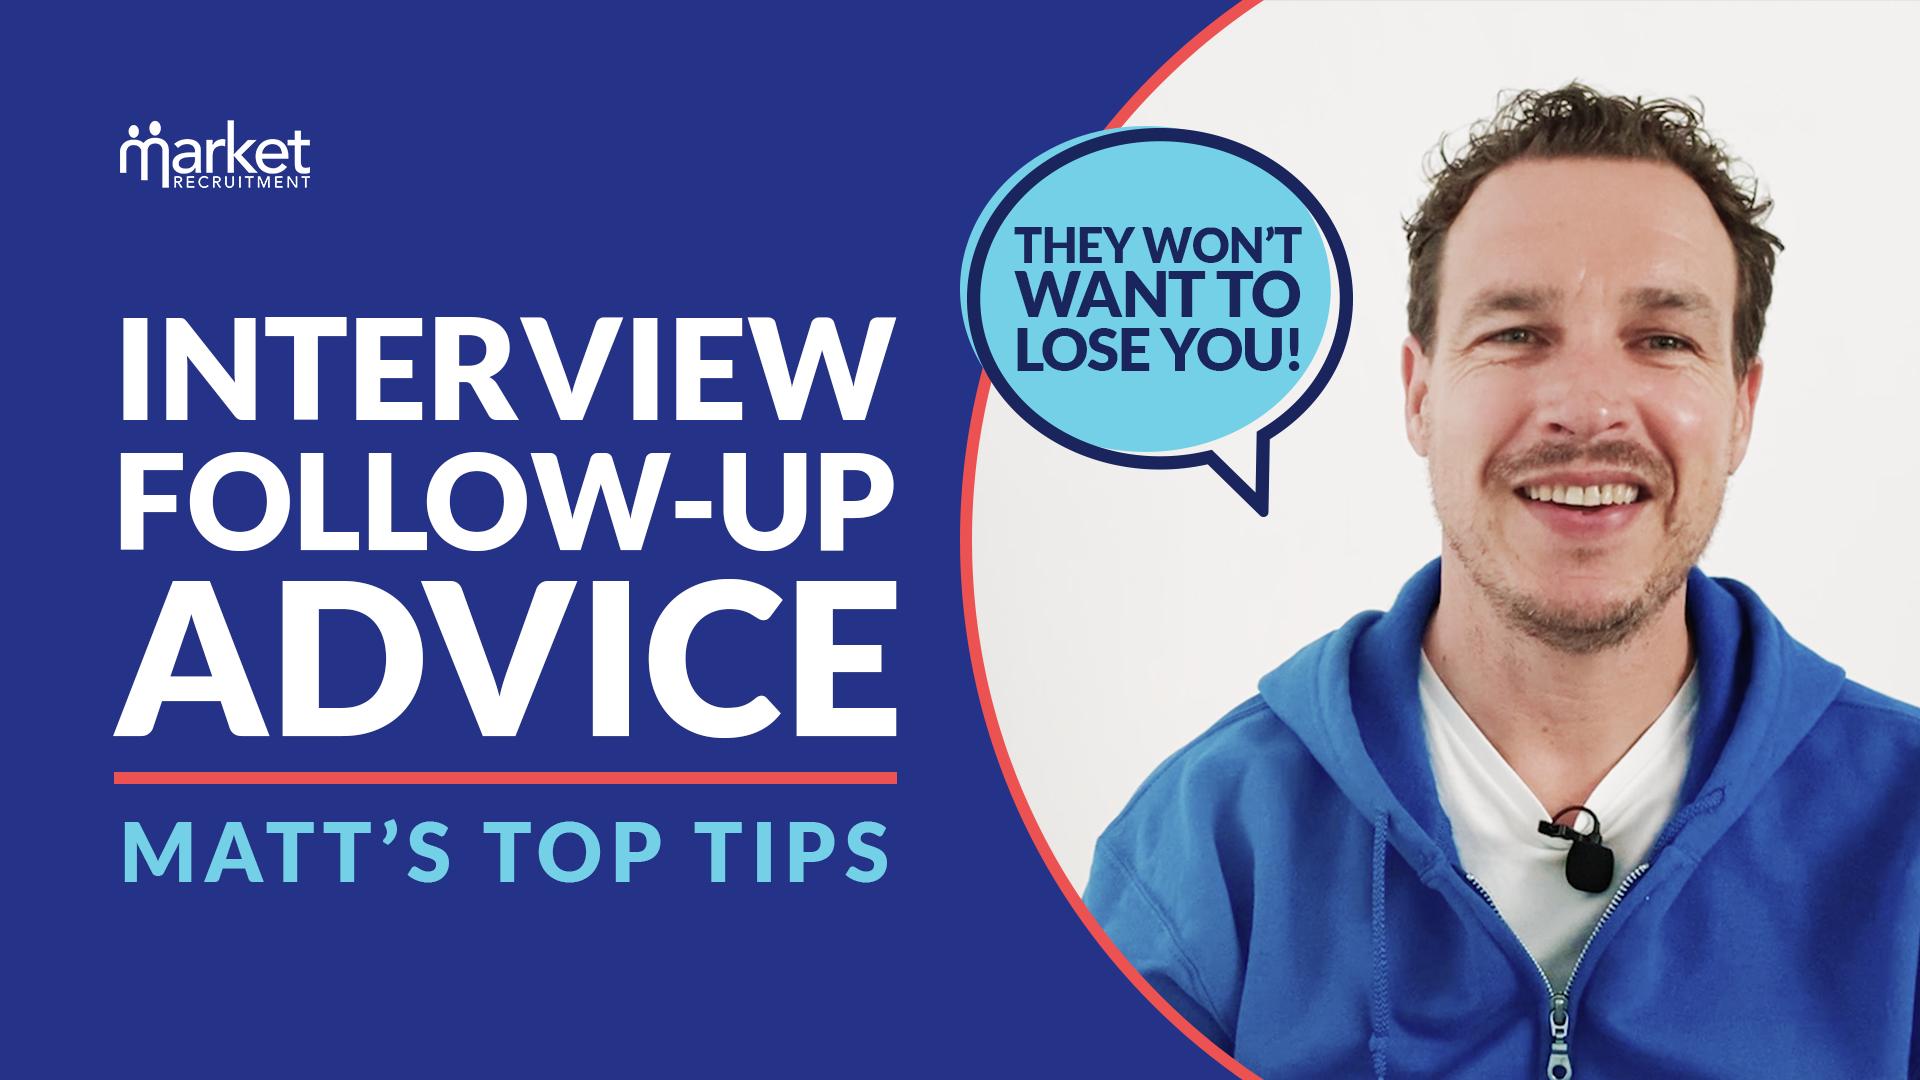 interview follow up advice